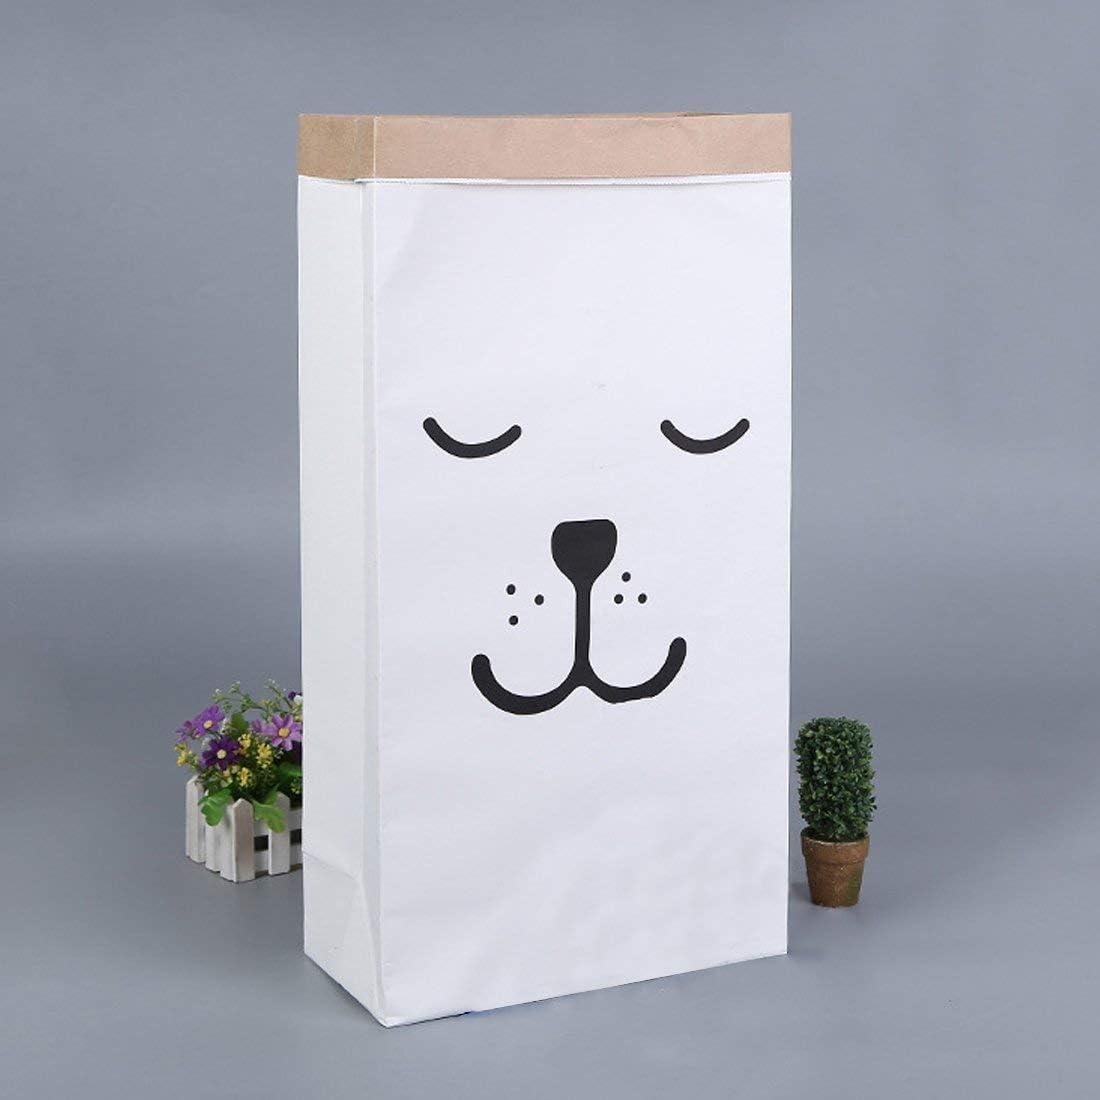 James tyle26/Caja Saco de Papel Papel Kraft Bolsa de Regalo Bolsa Cubo de Basura Bolsa de Papel Paper Bag habitaci/ón de los Ni/ños Juguete Blanco marr/ón